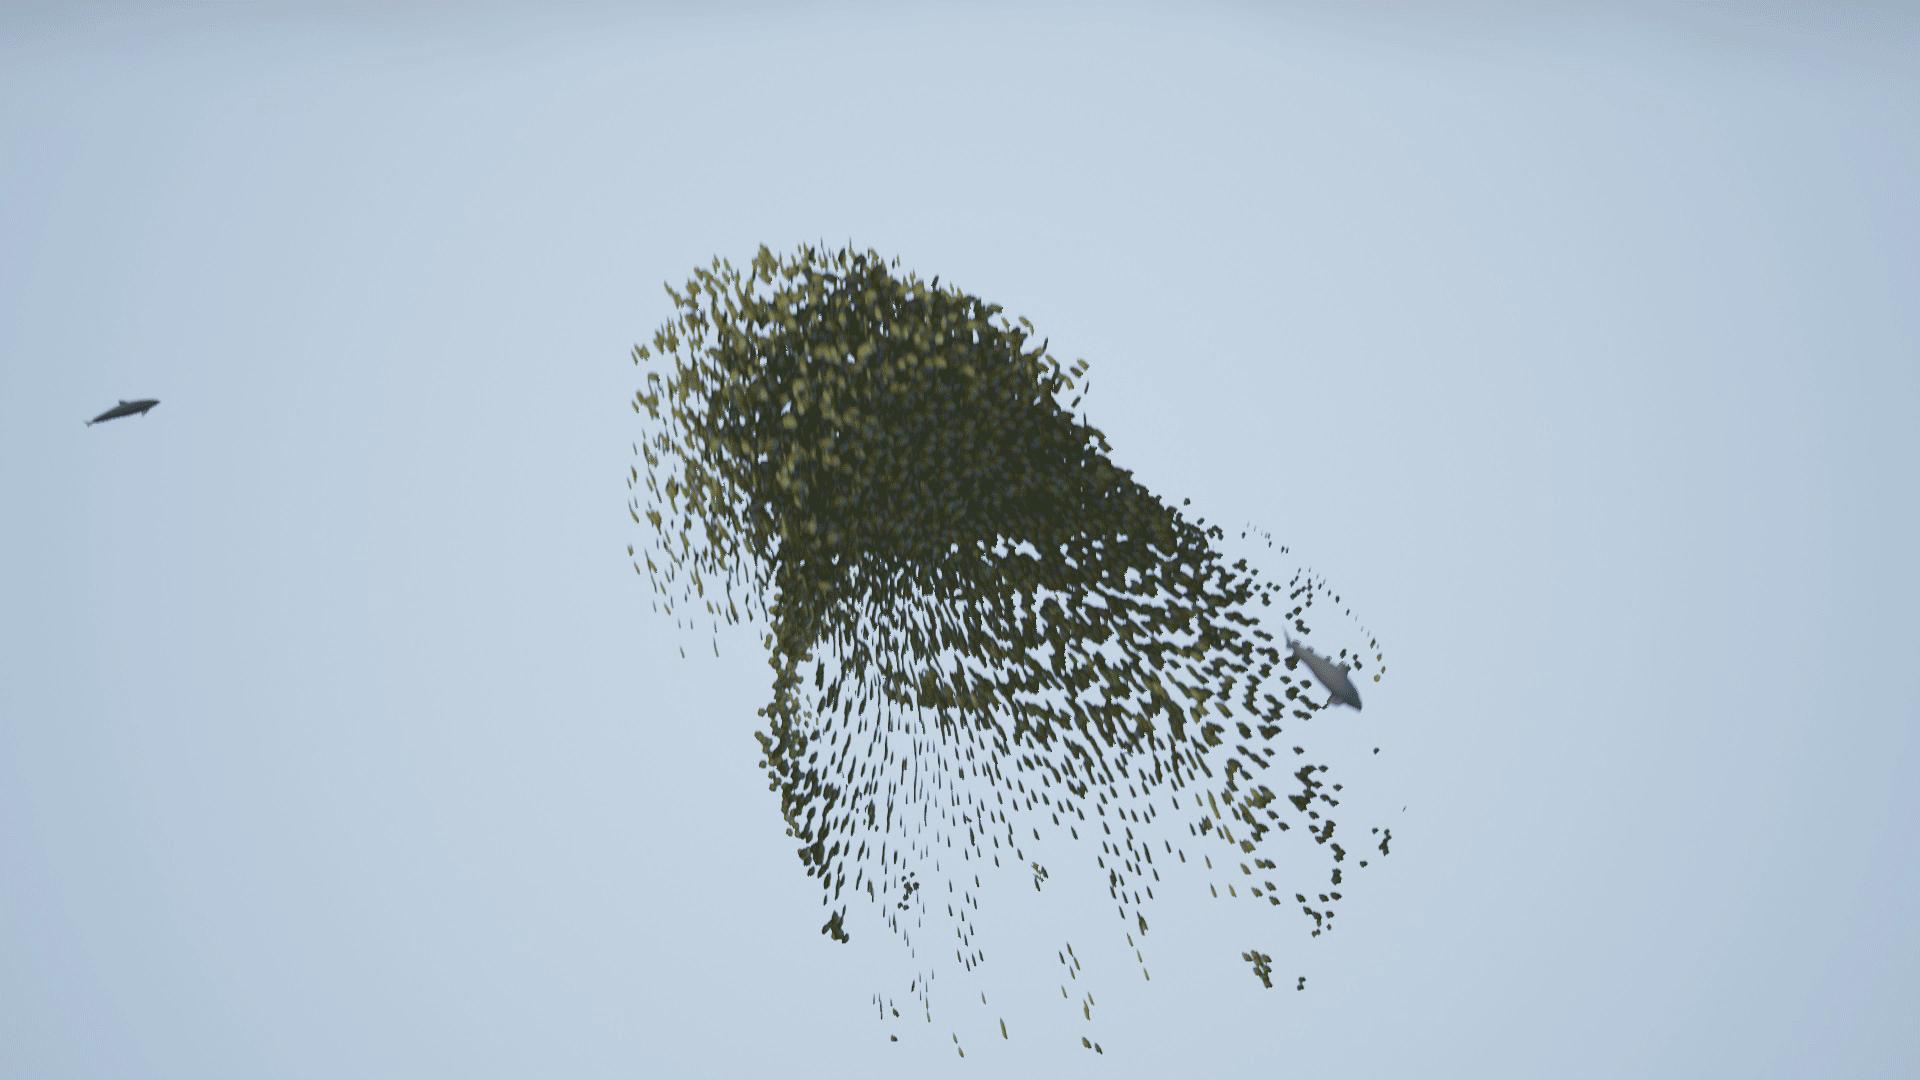 Multi Thread Flock Fish by JILEI ZHAO in Code Plugins - UE4